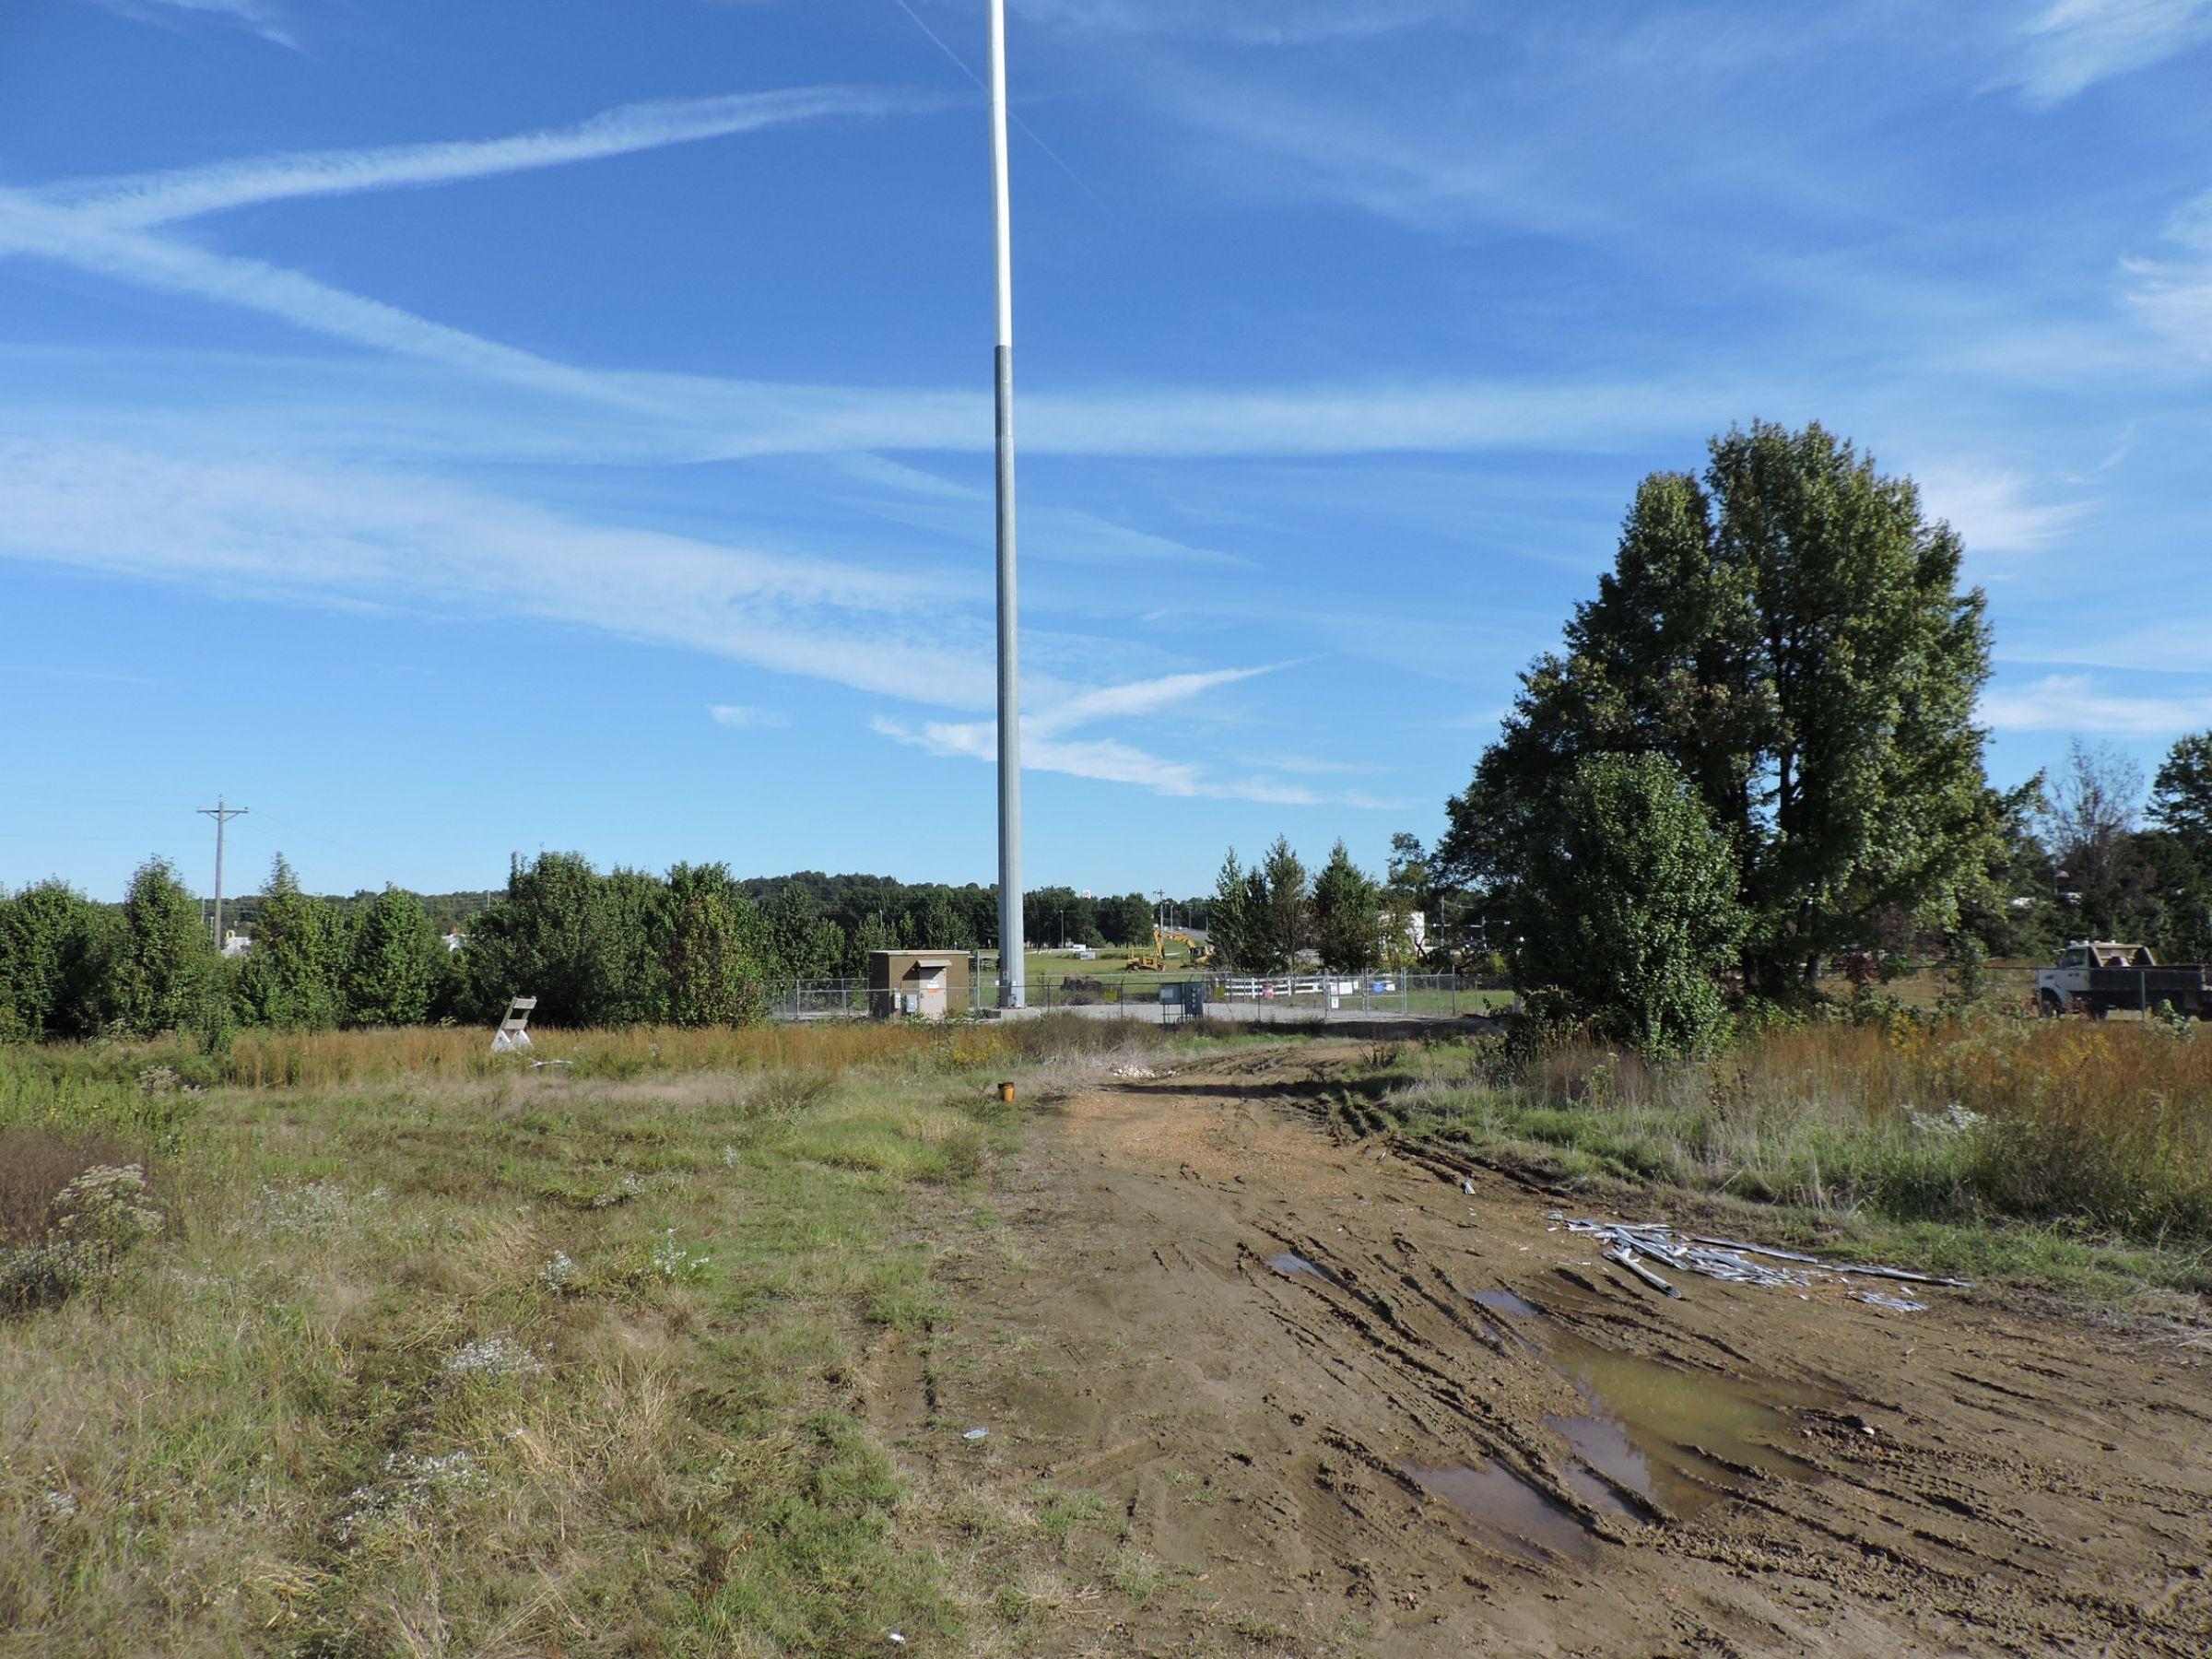 craighead-county-arkansas-20-acres-listing-number-15036-0-2020-06-11-202630.JPG